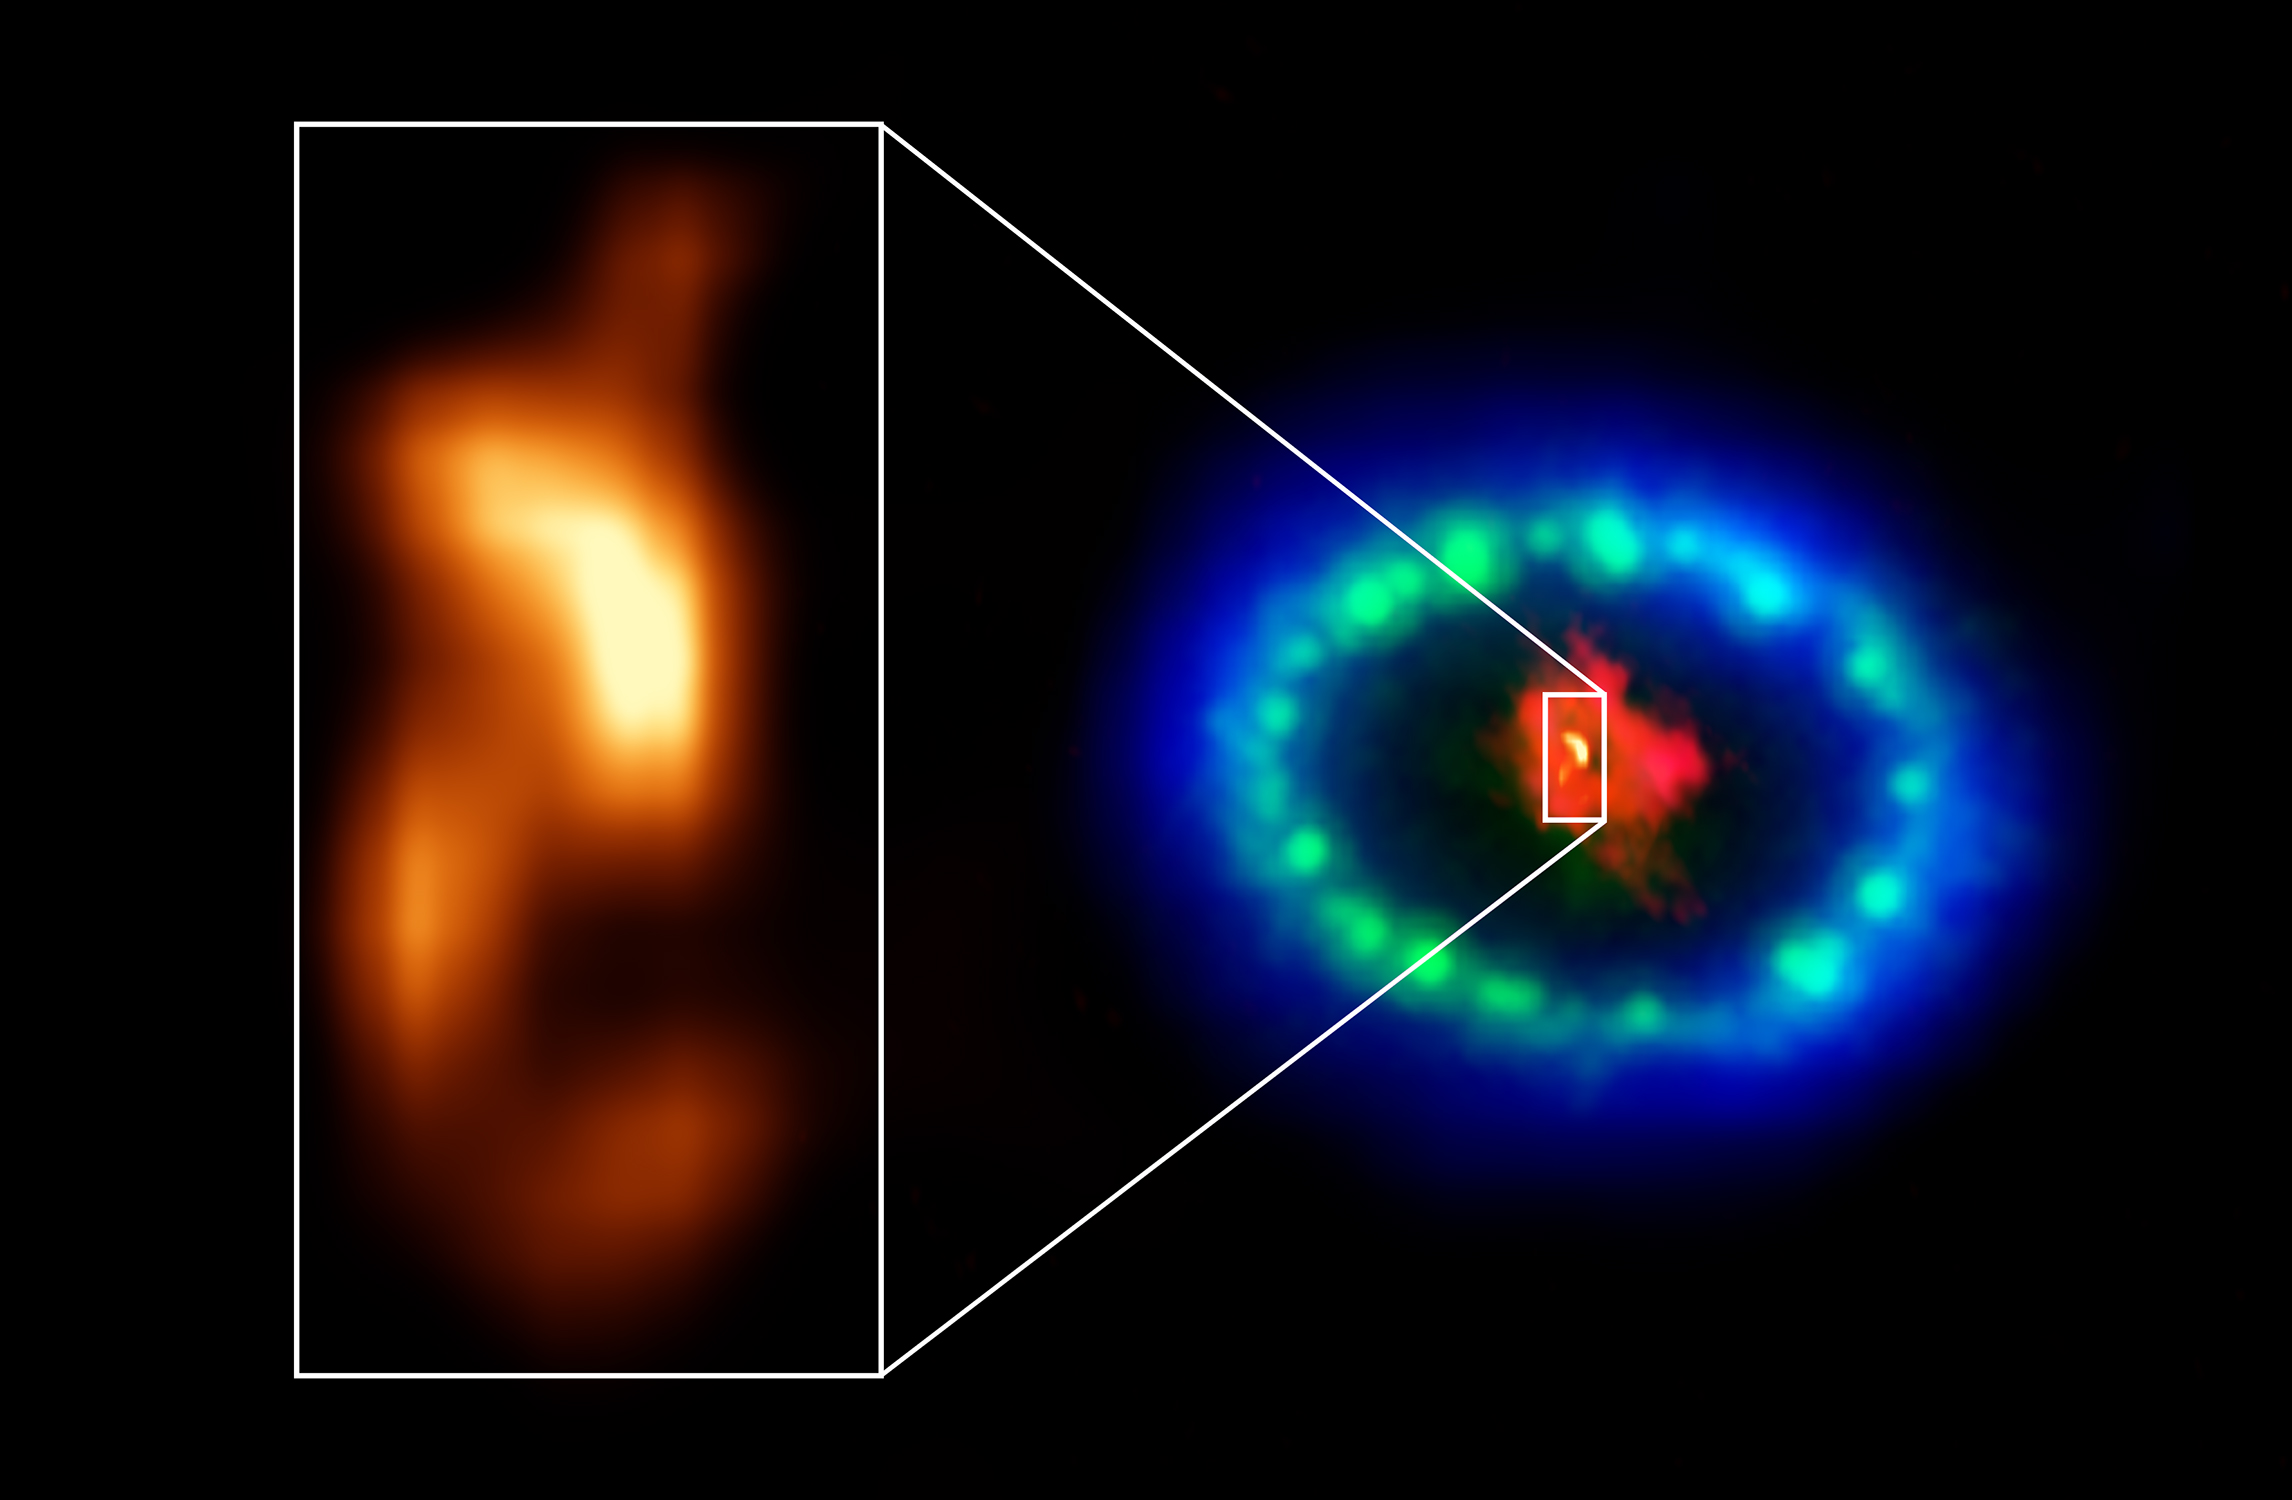 """The blob"" in Supernova 1987A"